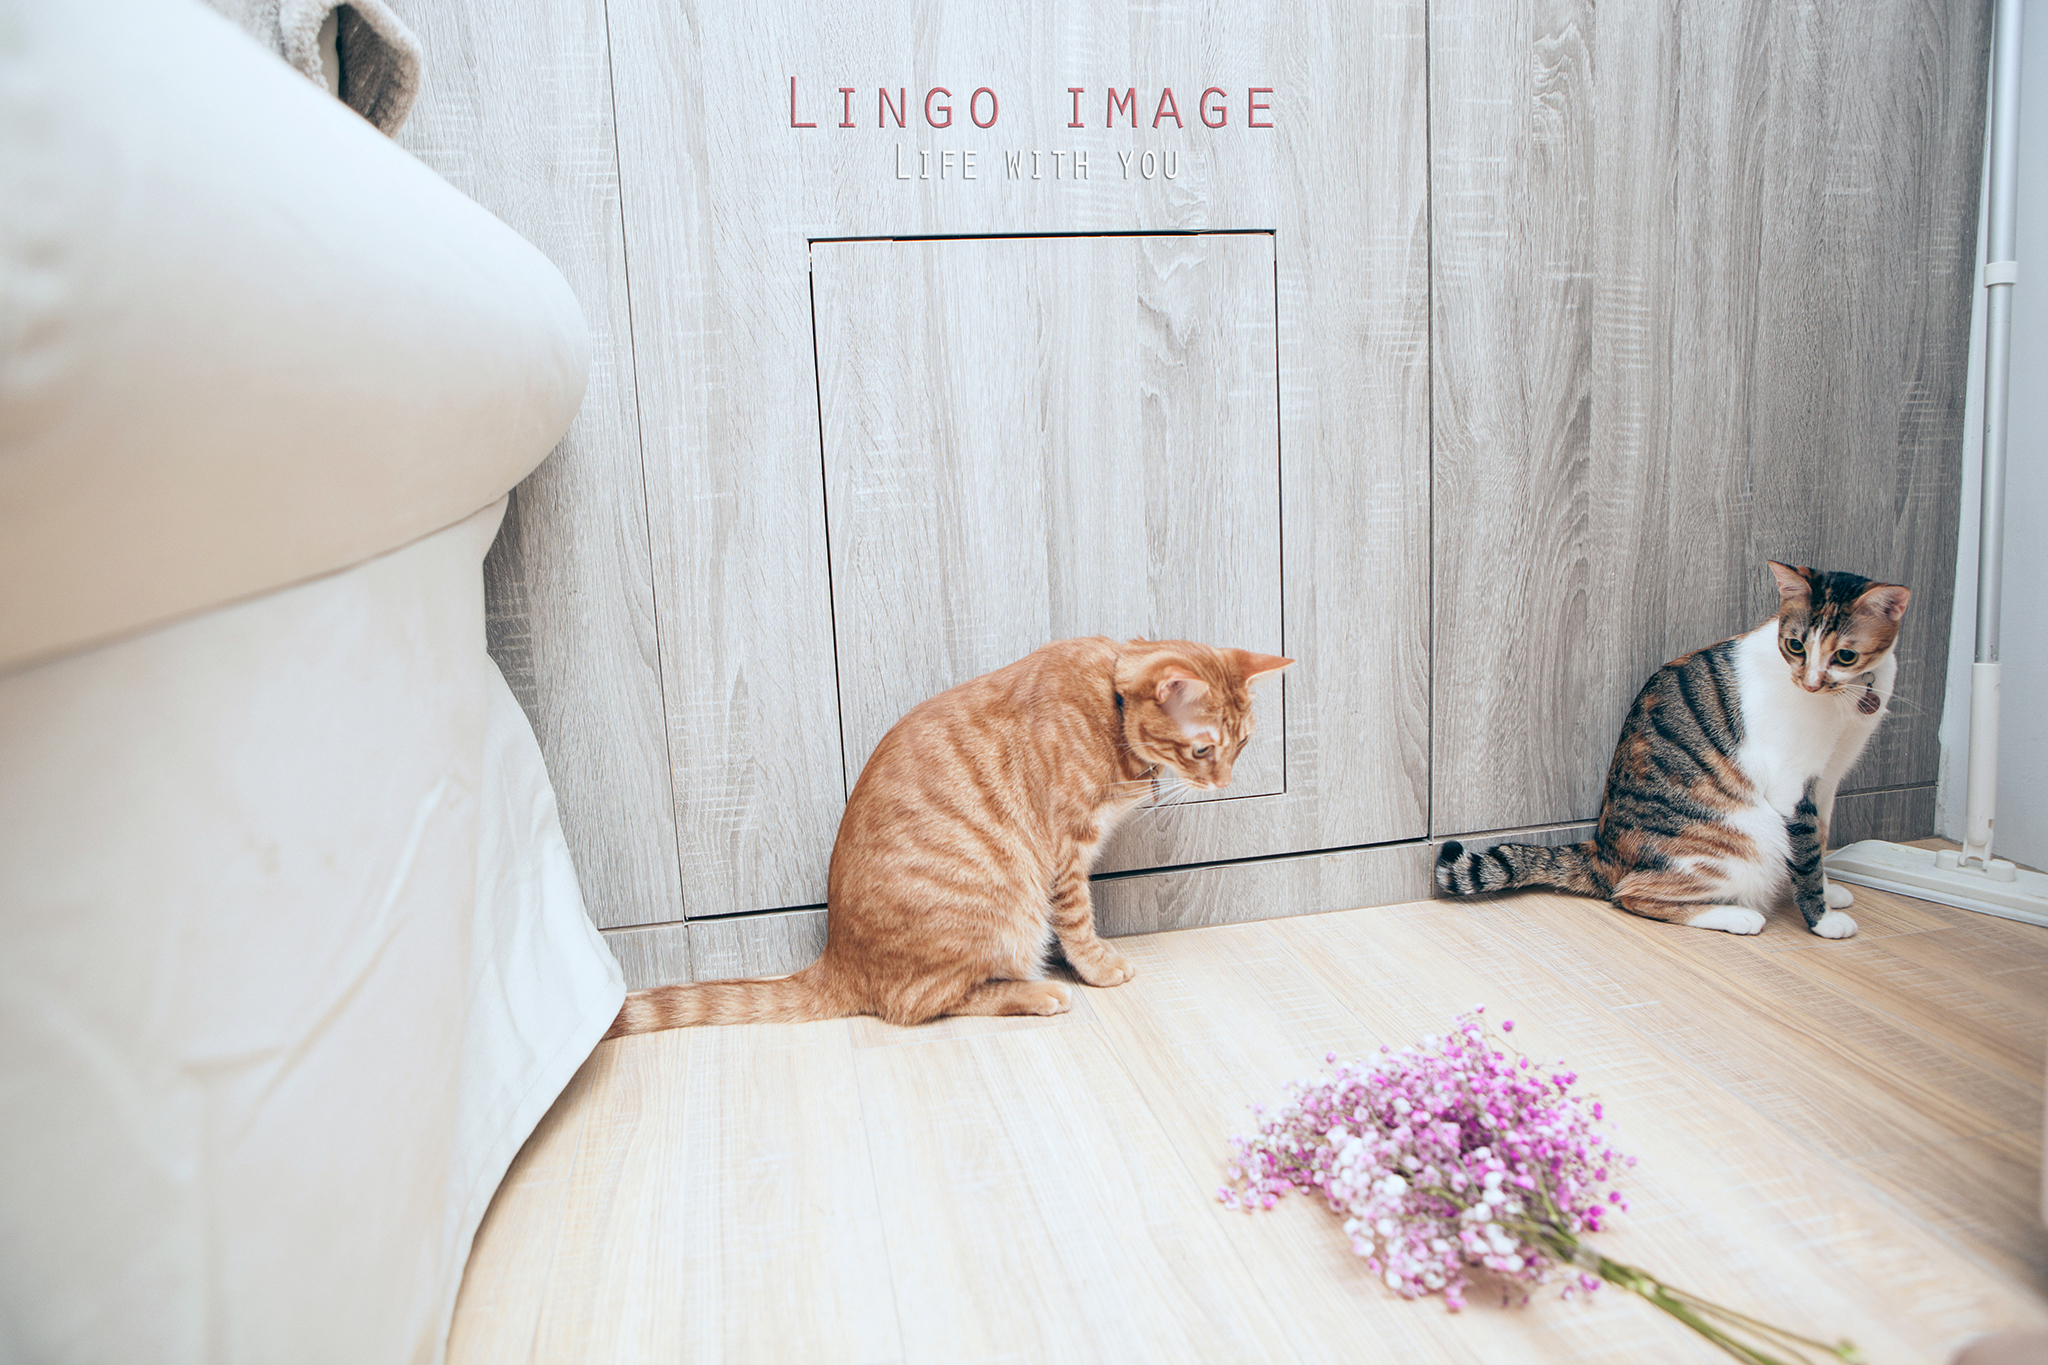 Lingo image_寵物78